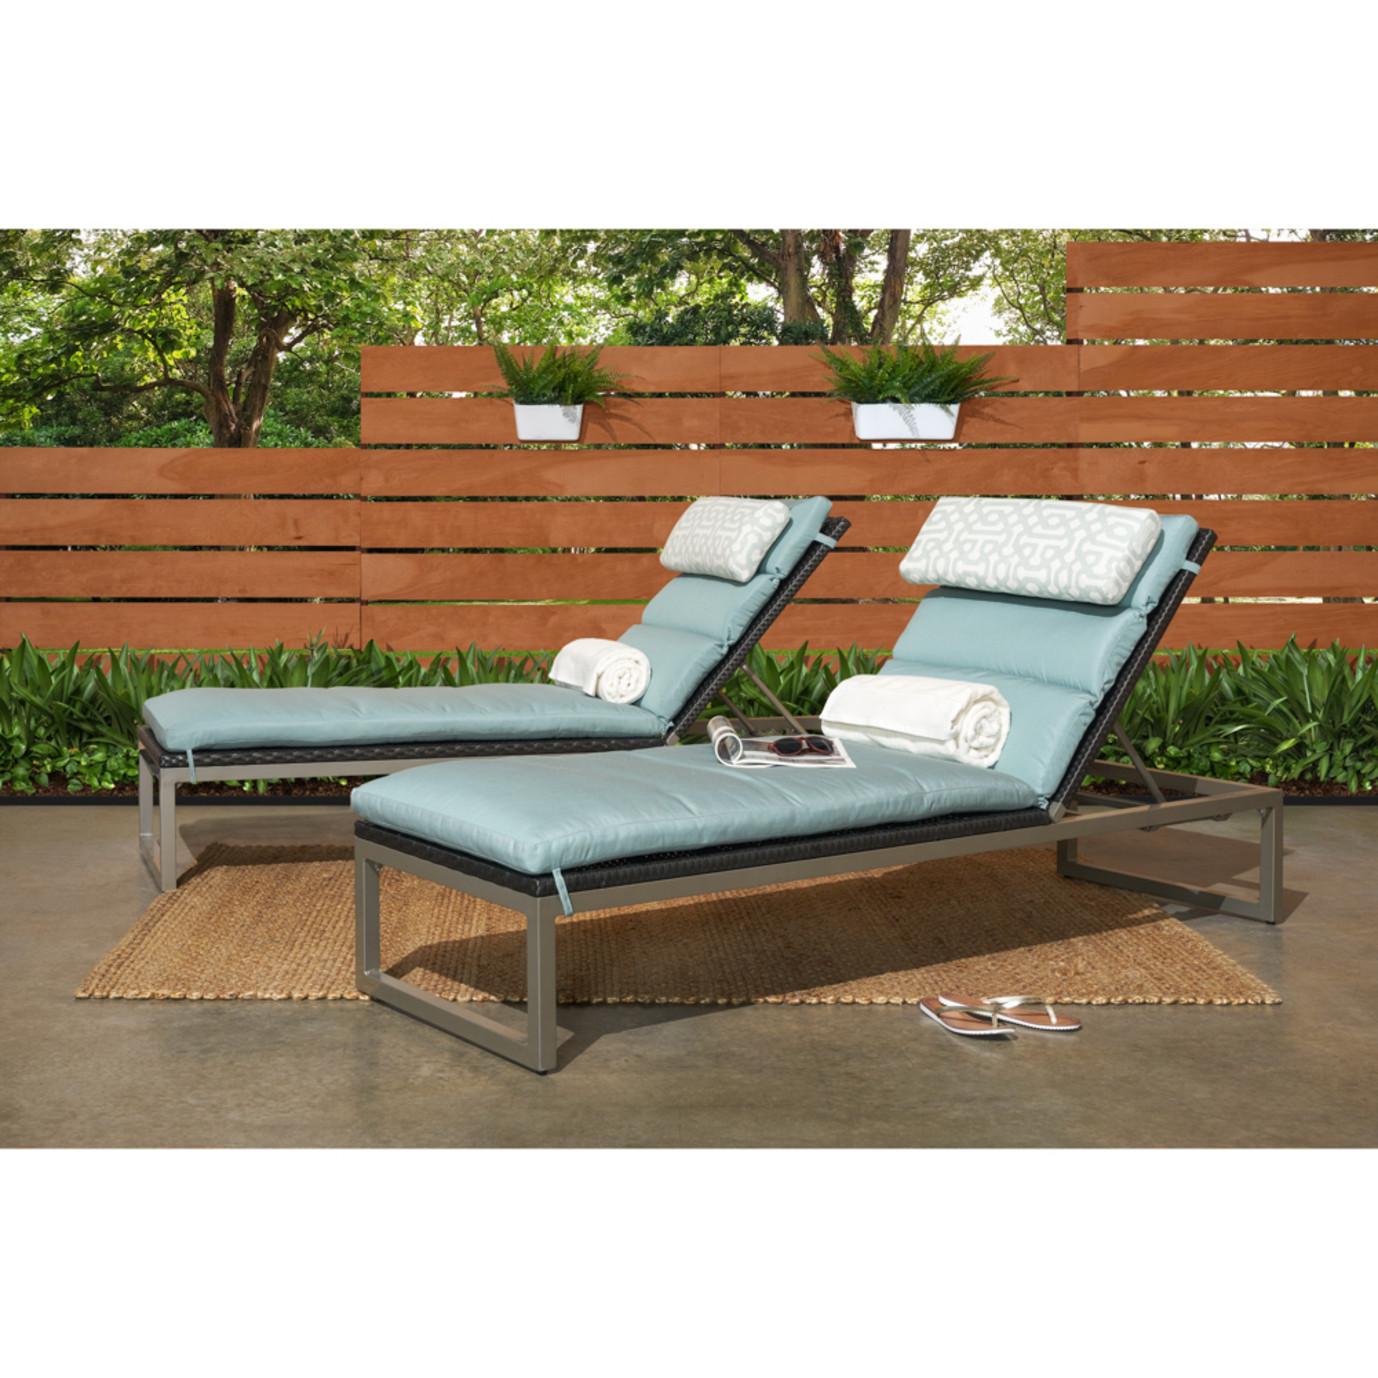 Milo™ Espresso Chaise Lounges - Spa Blue